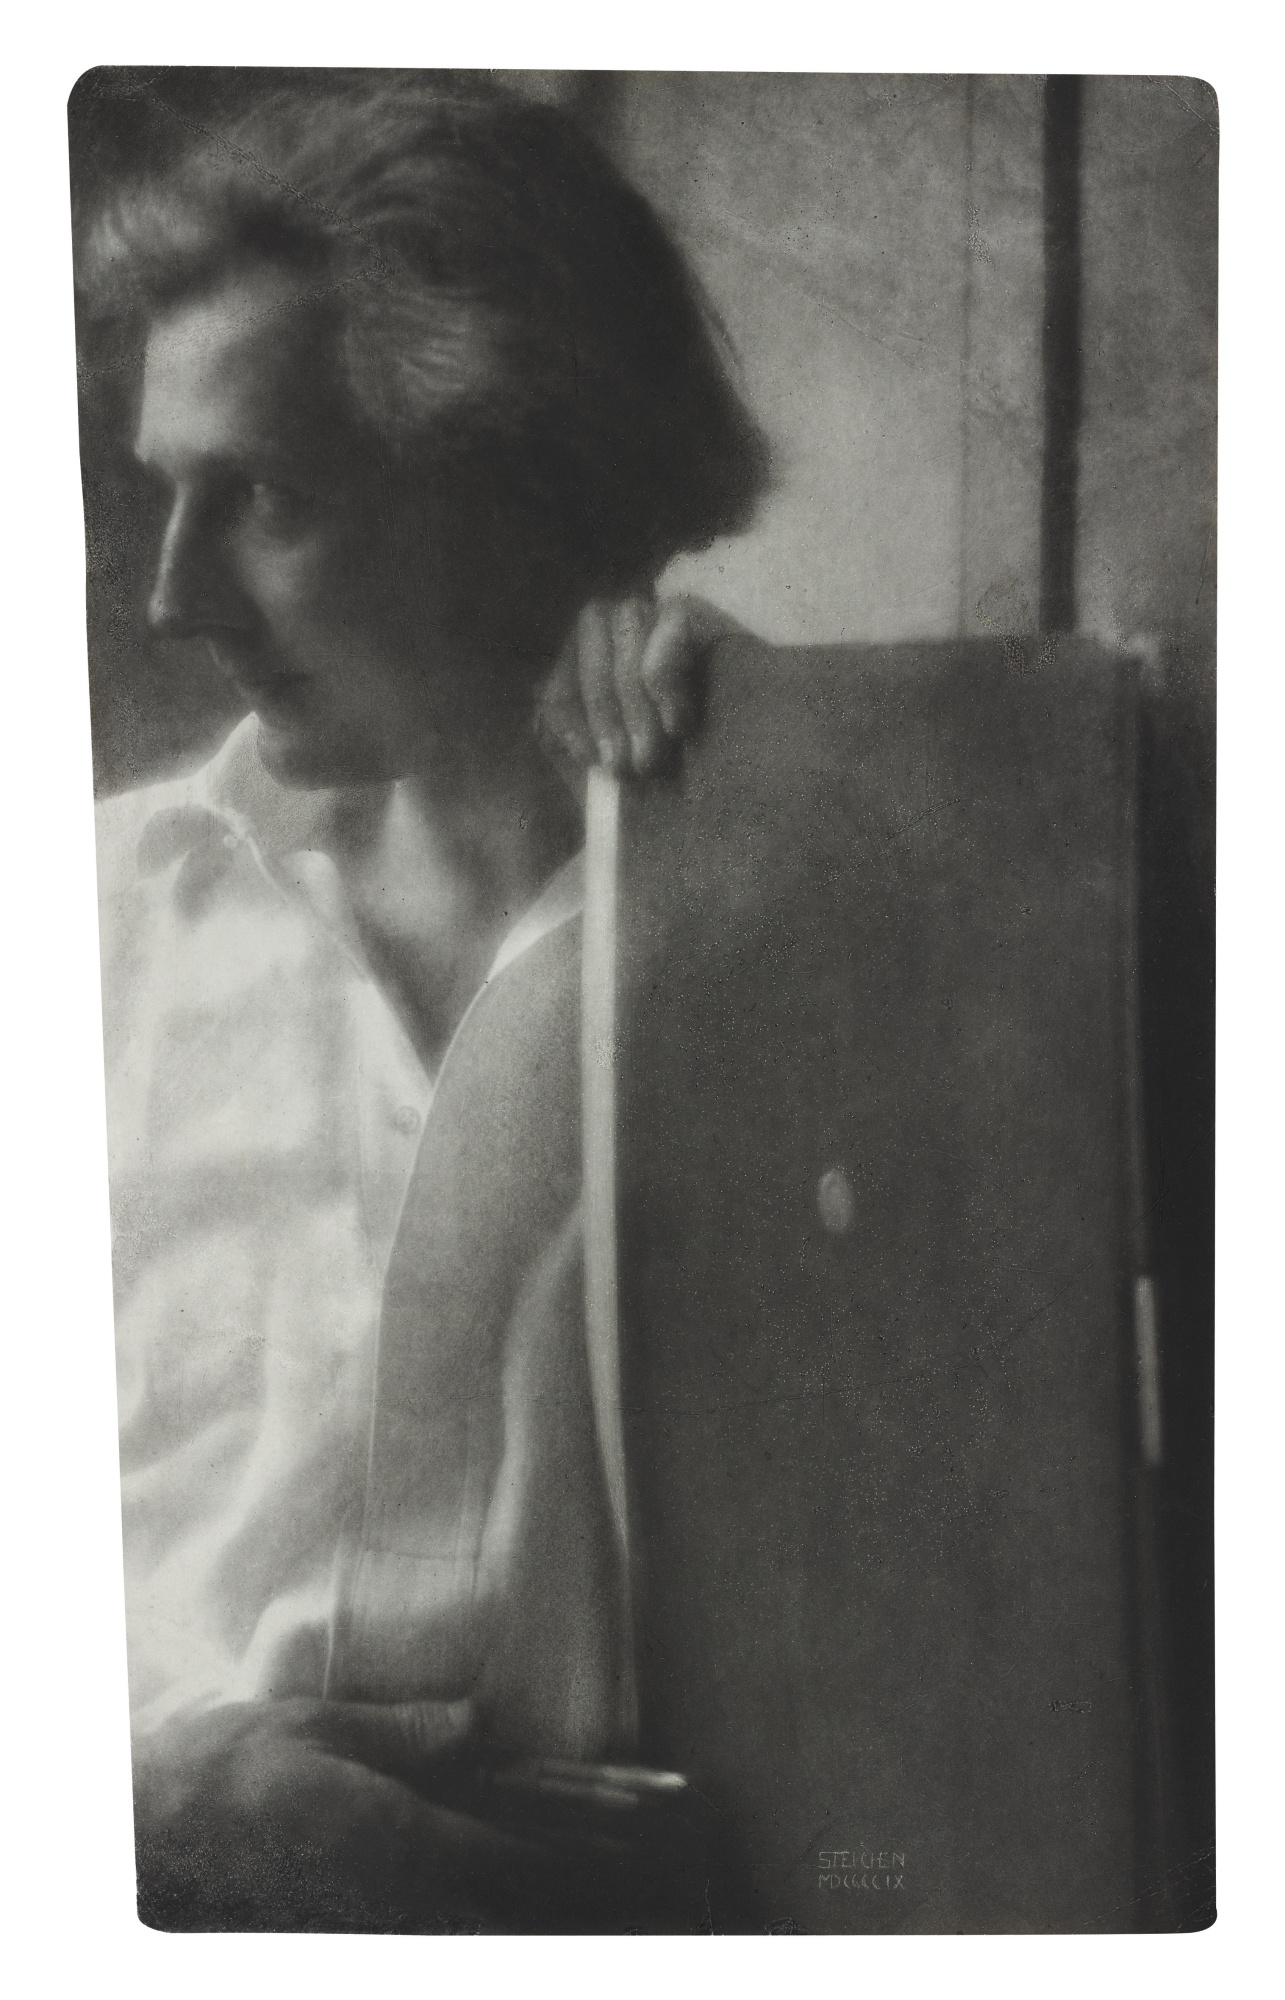 Edward Steichen-Profile Portrait Of Edward Gordon Craig-1909